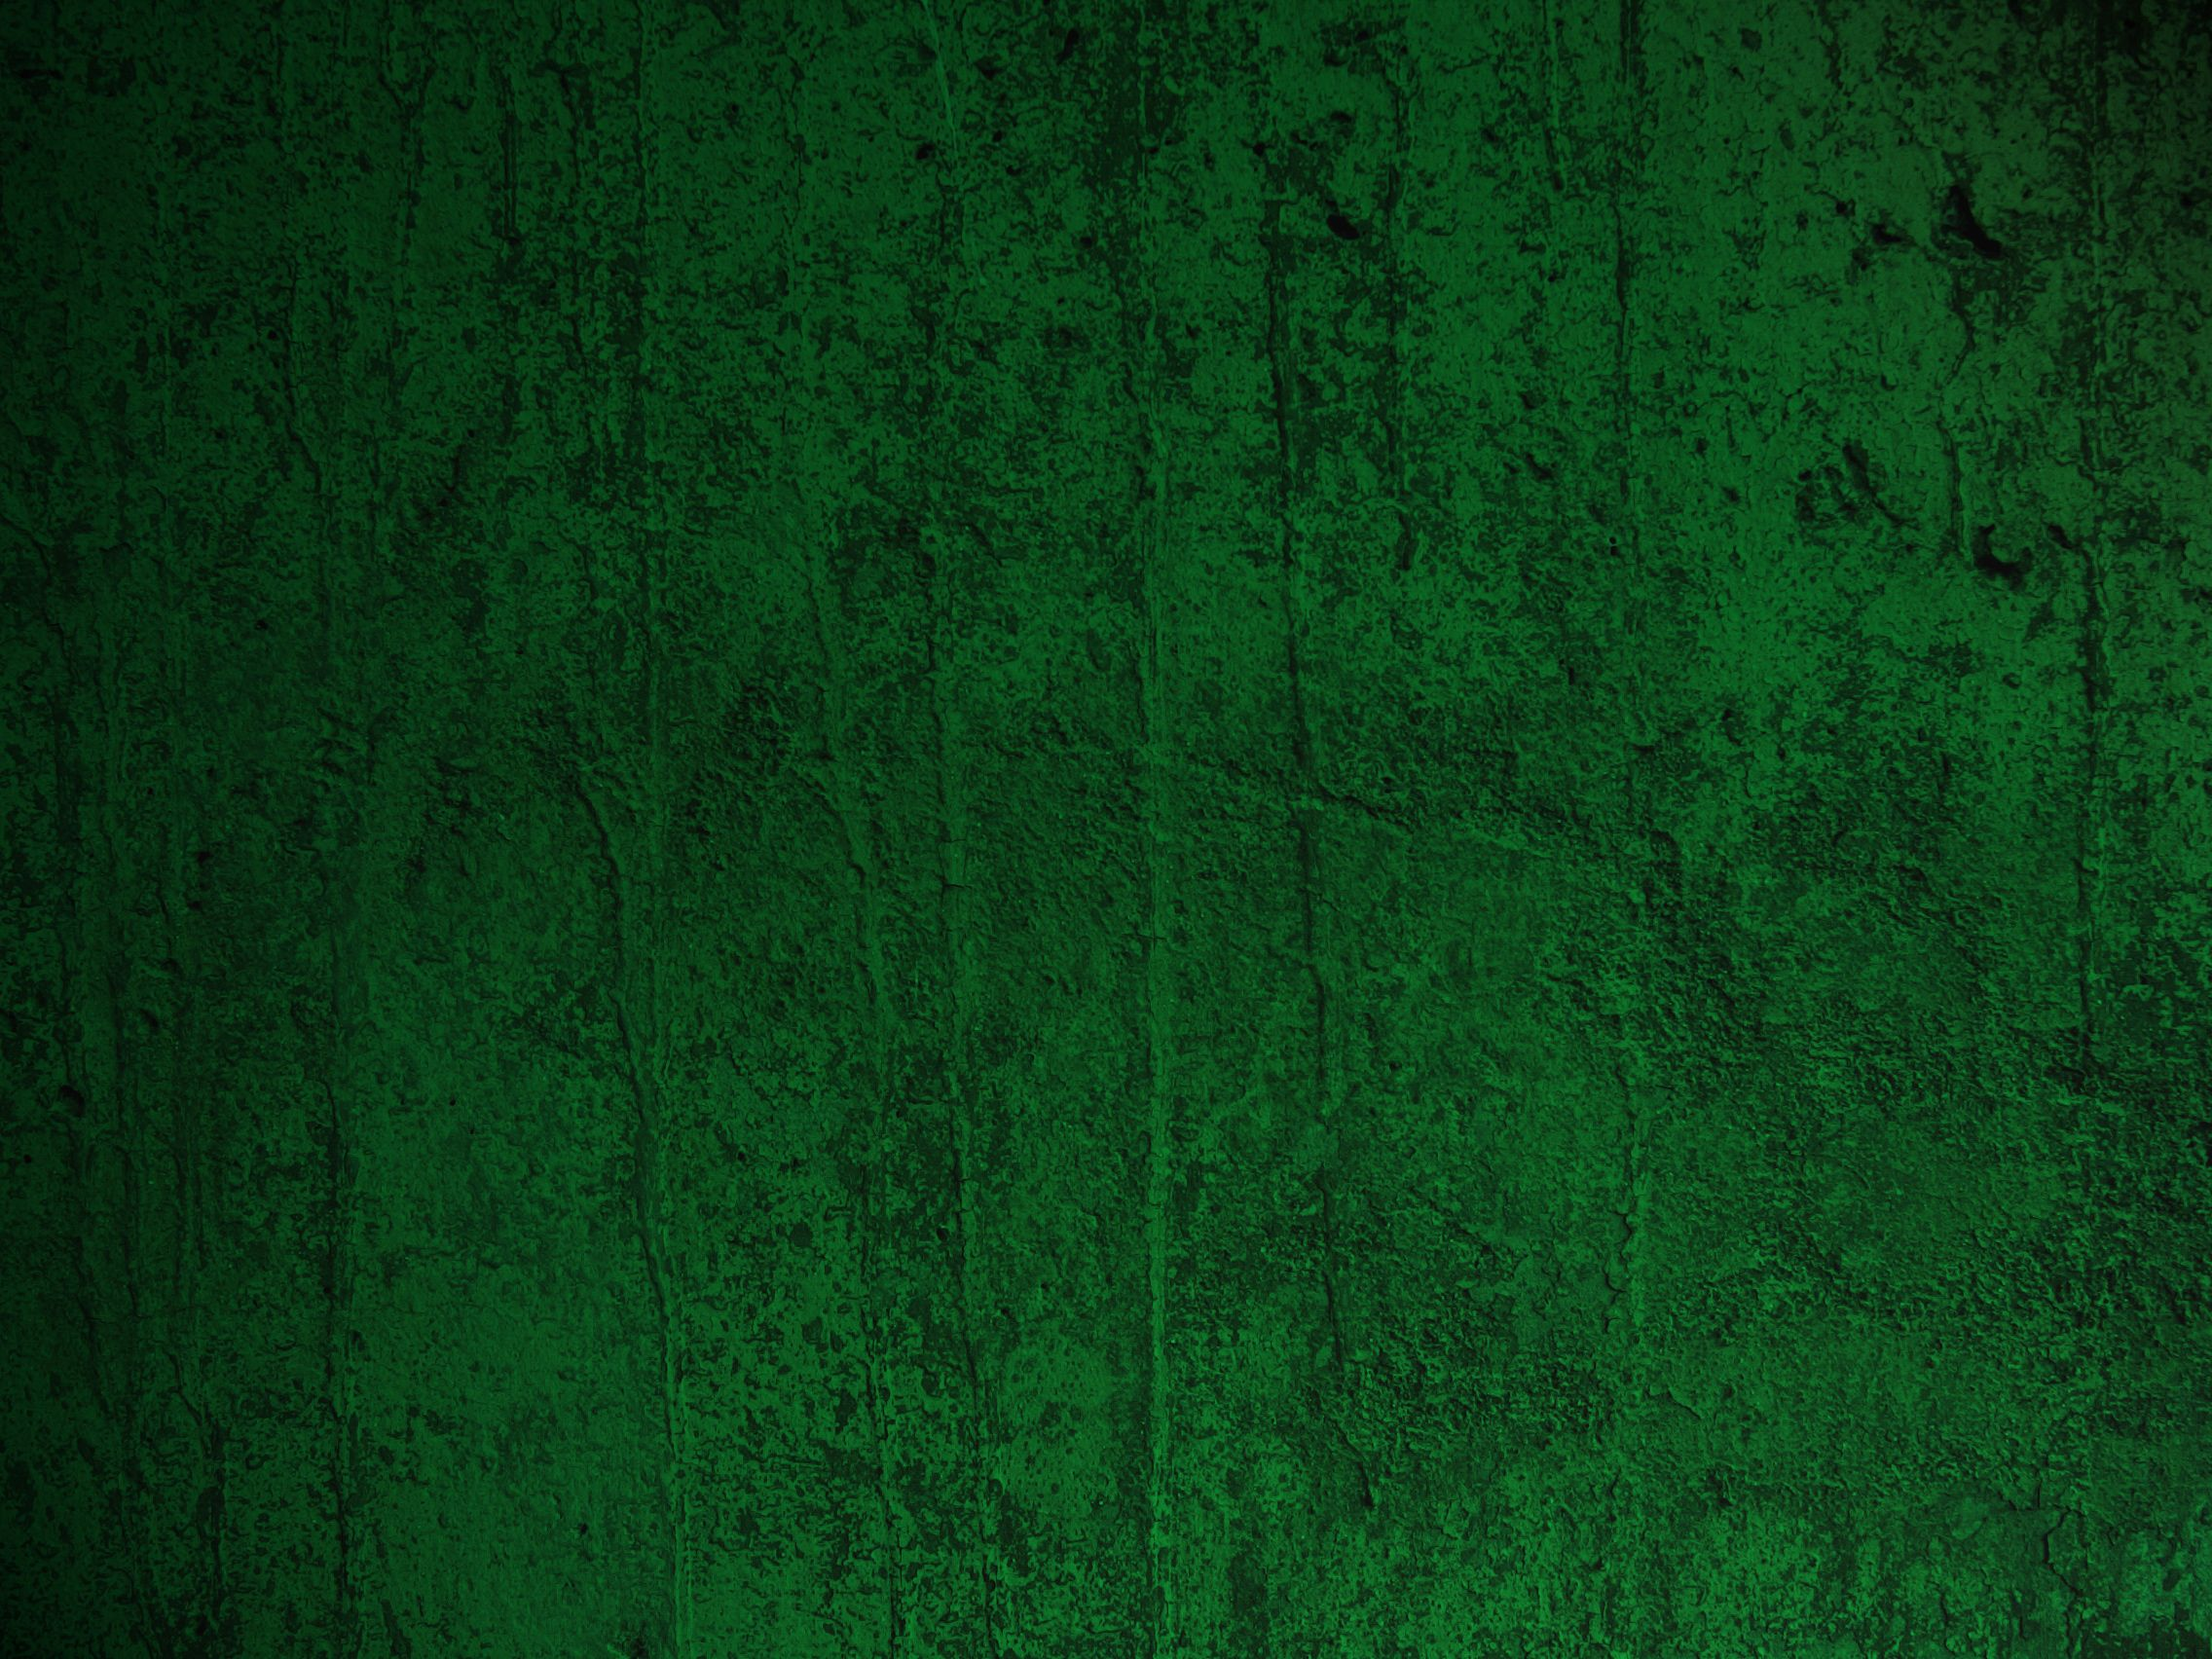 83 Olive Wallpapers On Wallpapersafari